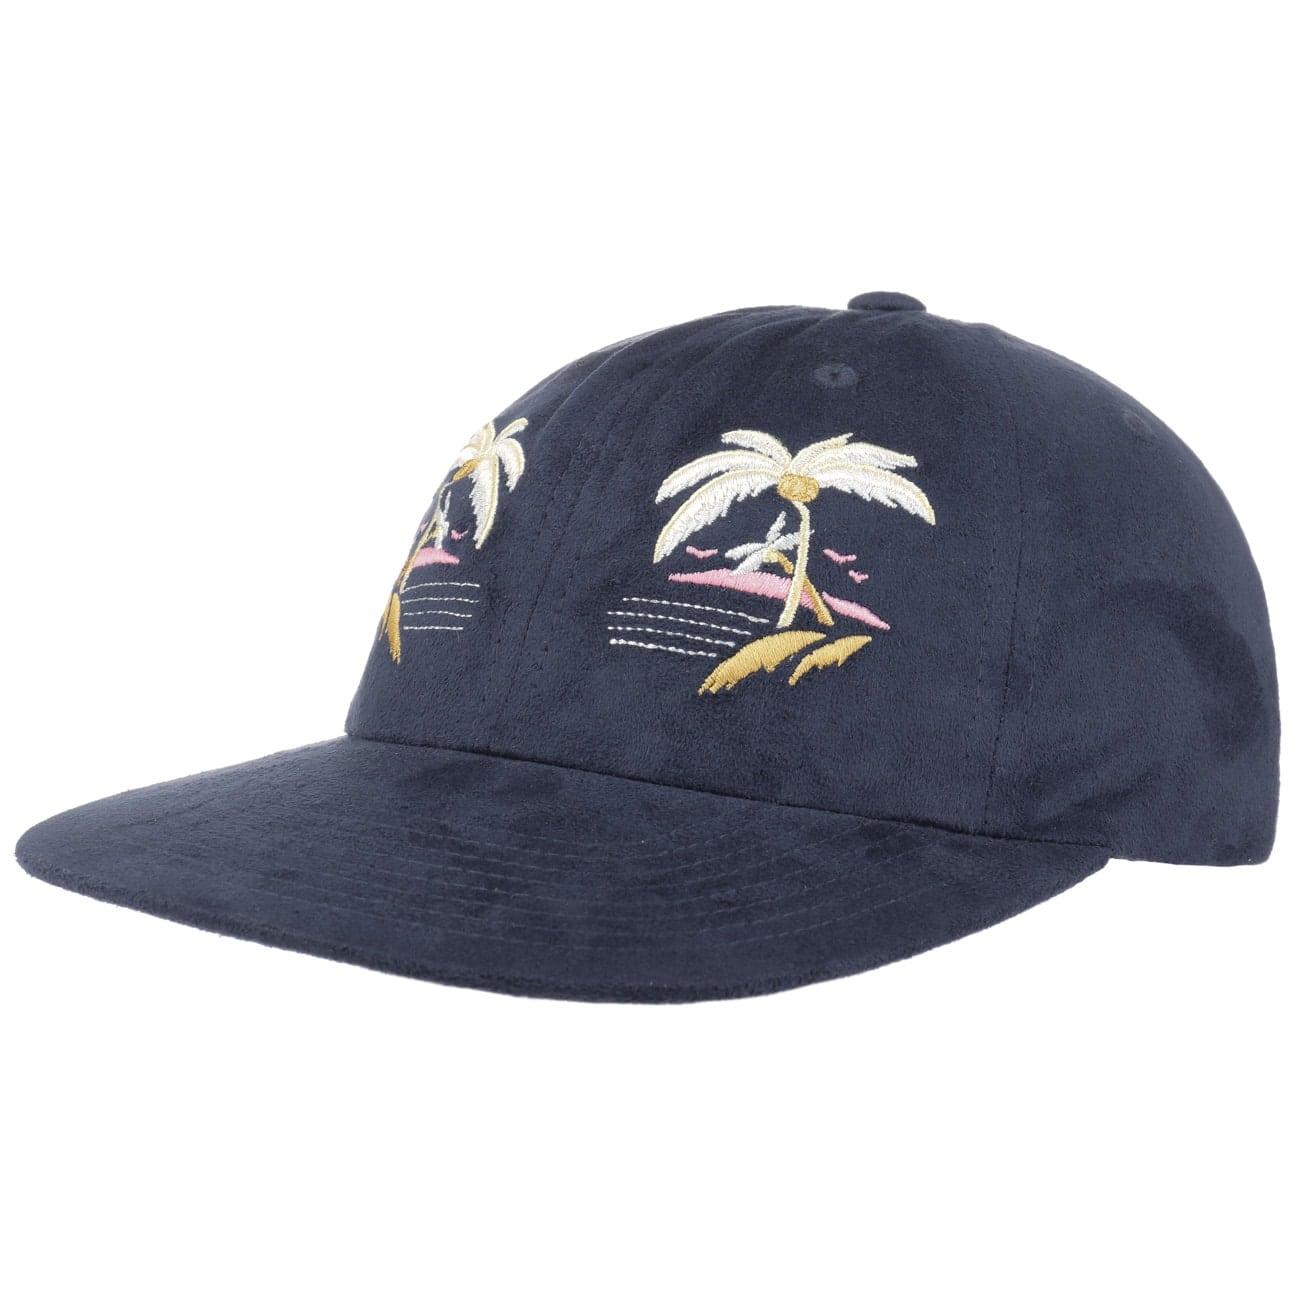 Casquette Souvenir Strapback by HUF  baseball cap